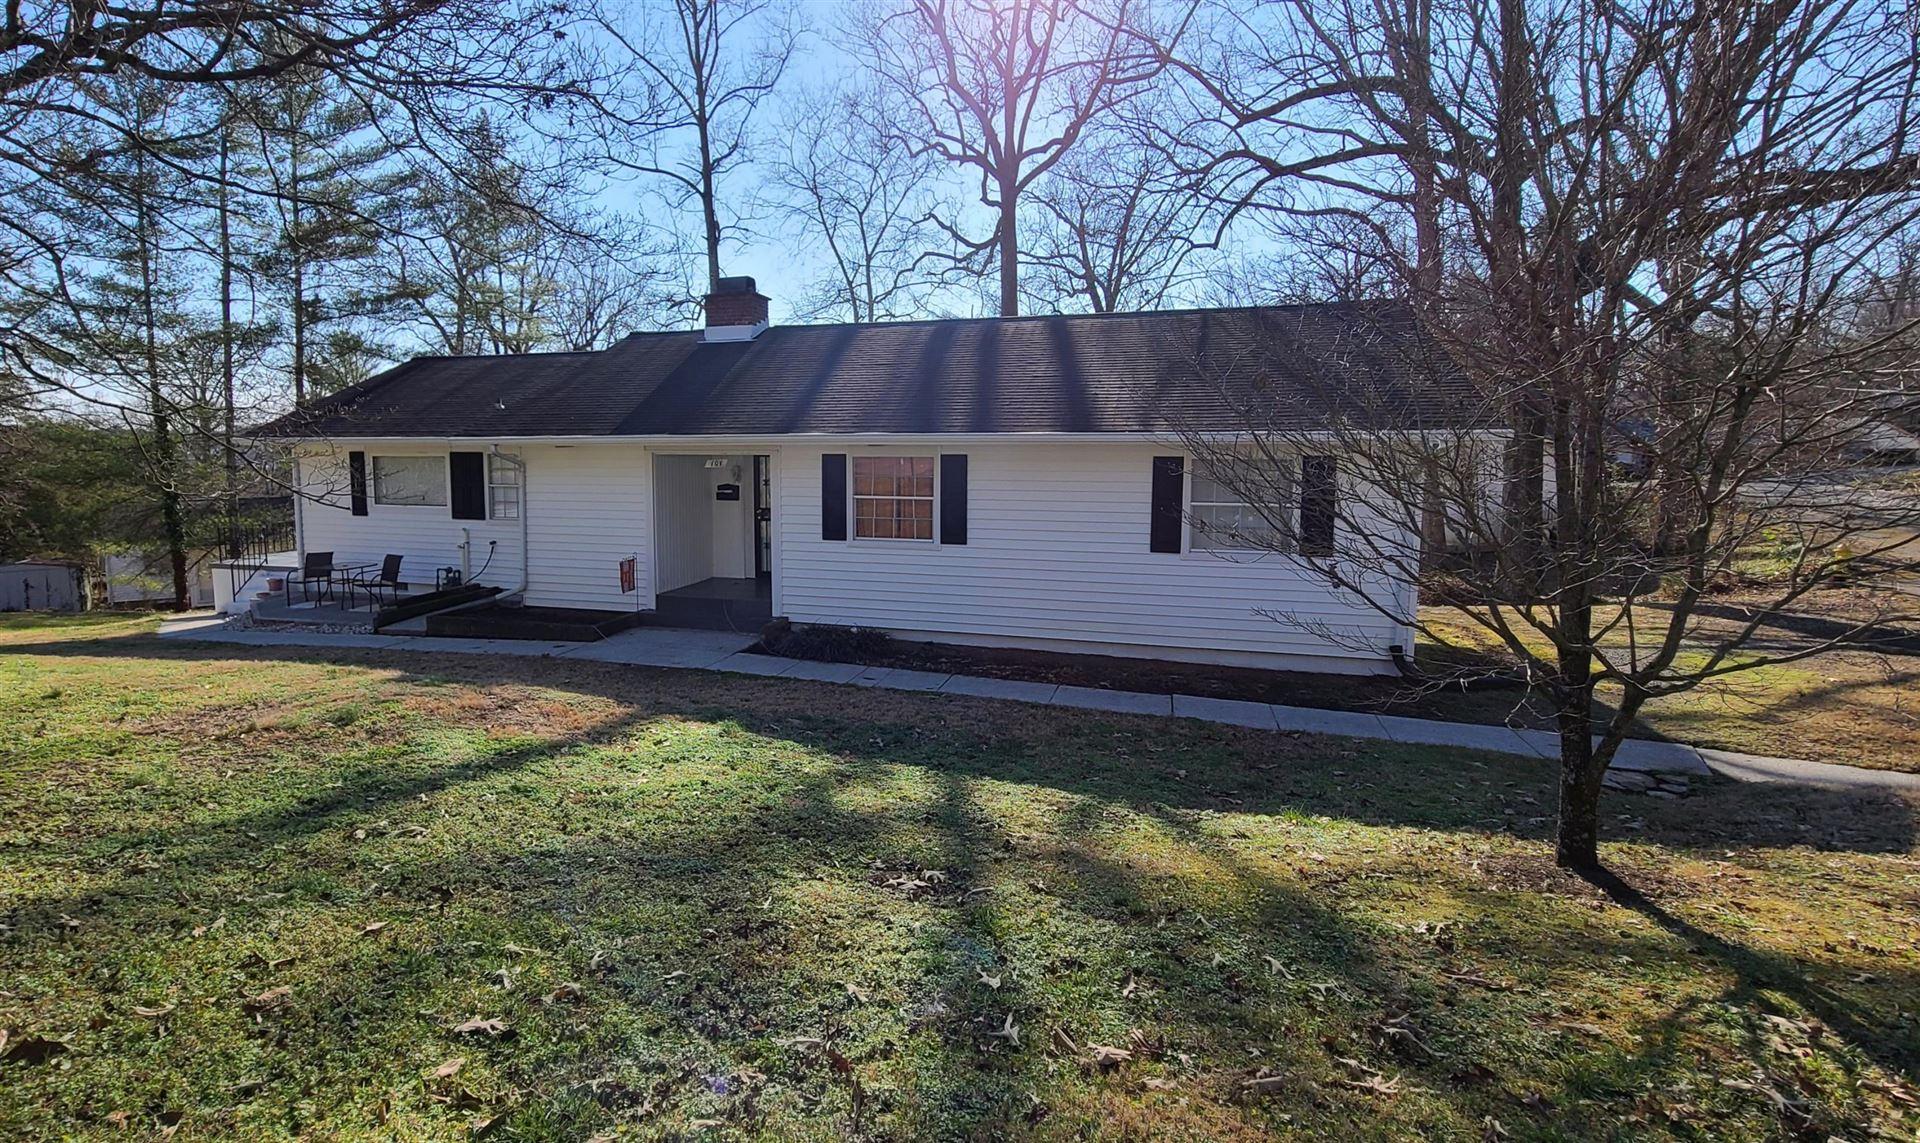 Photo of 101 Plymouth Circle, Oak Ridge, TN 37830 (MLS # 1139249)